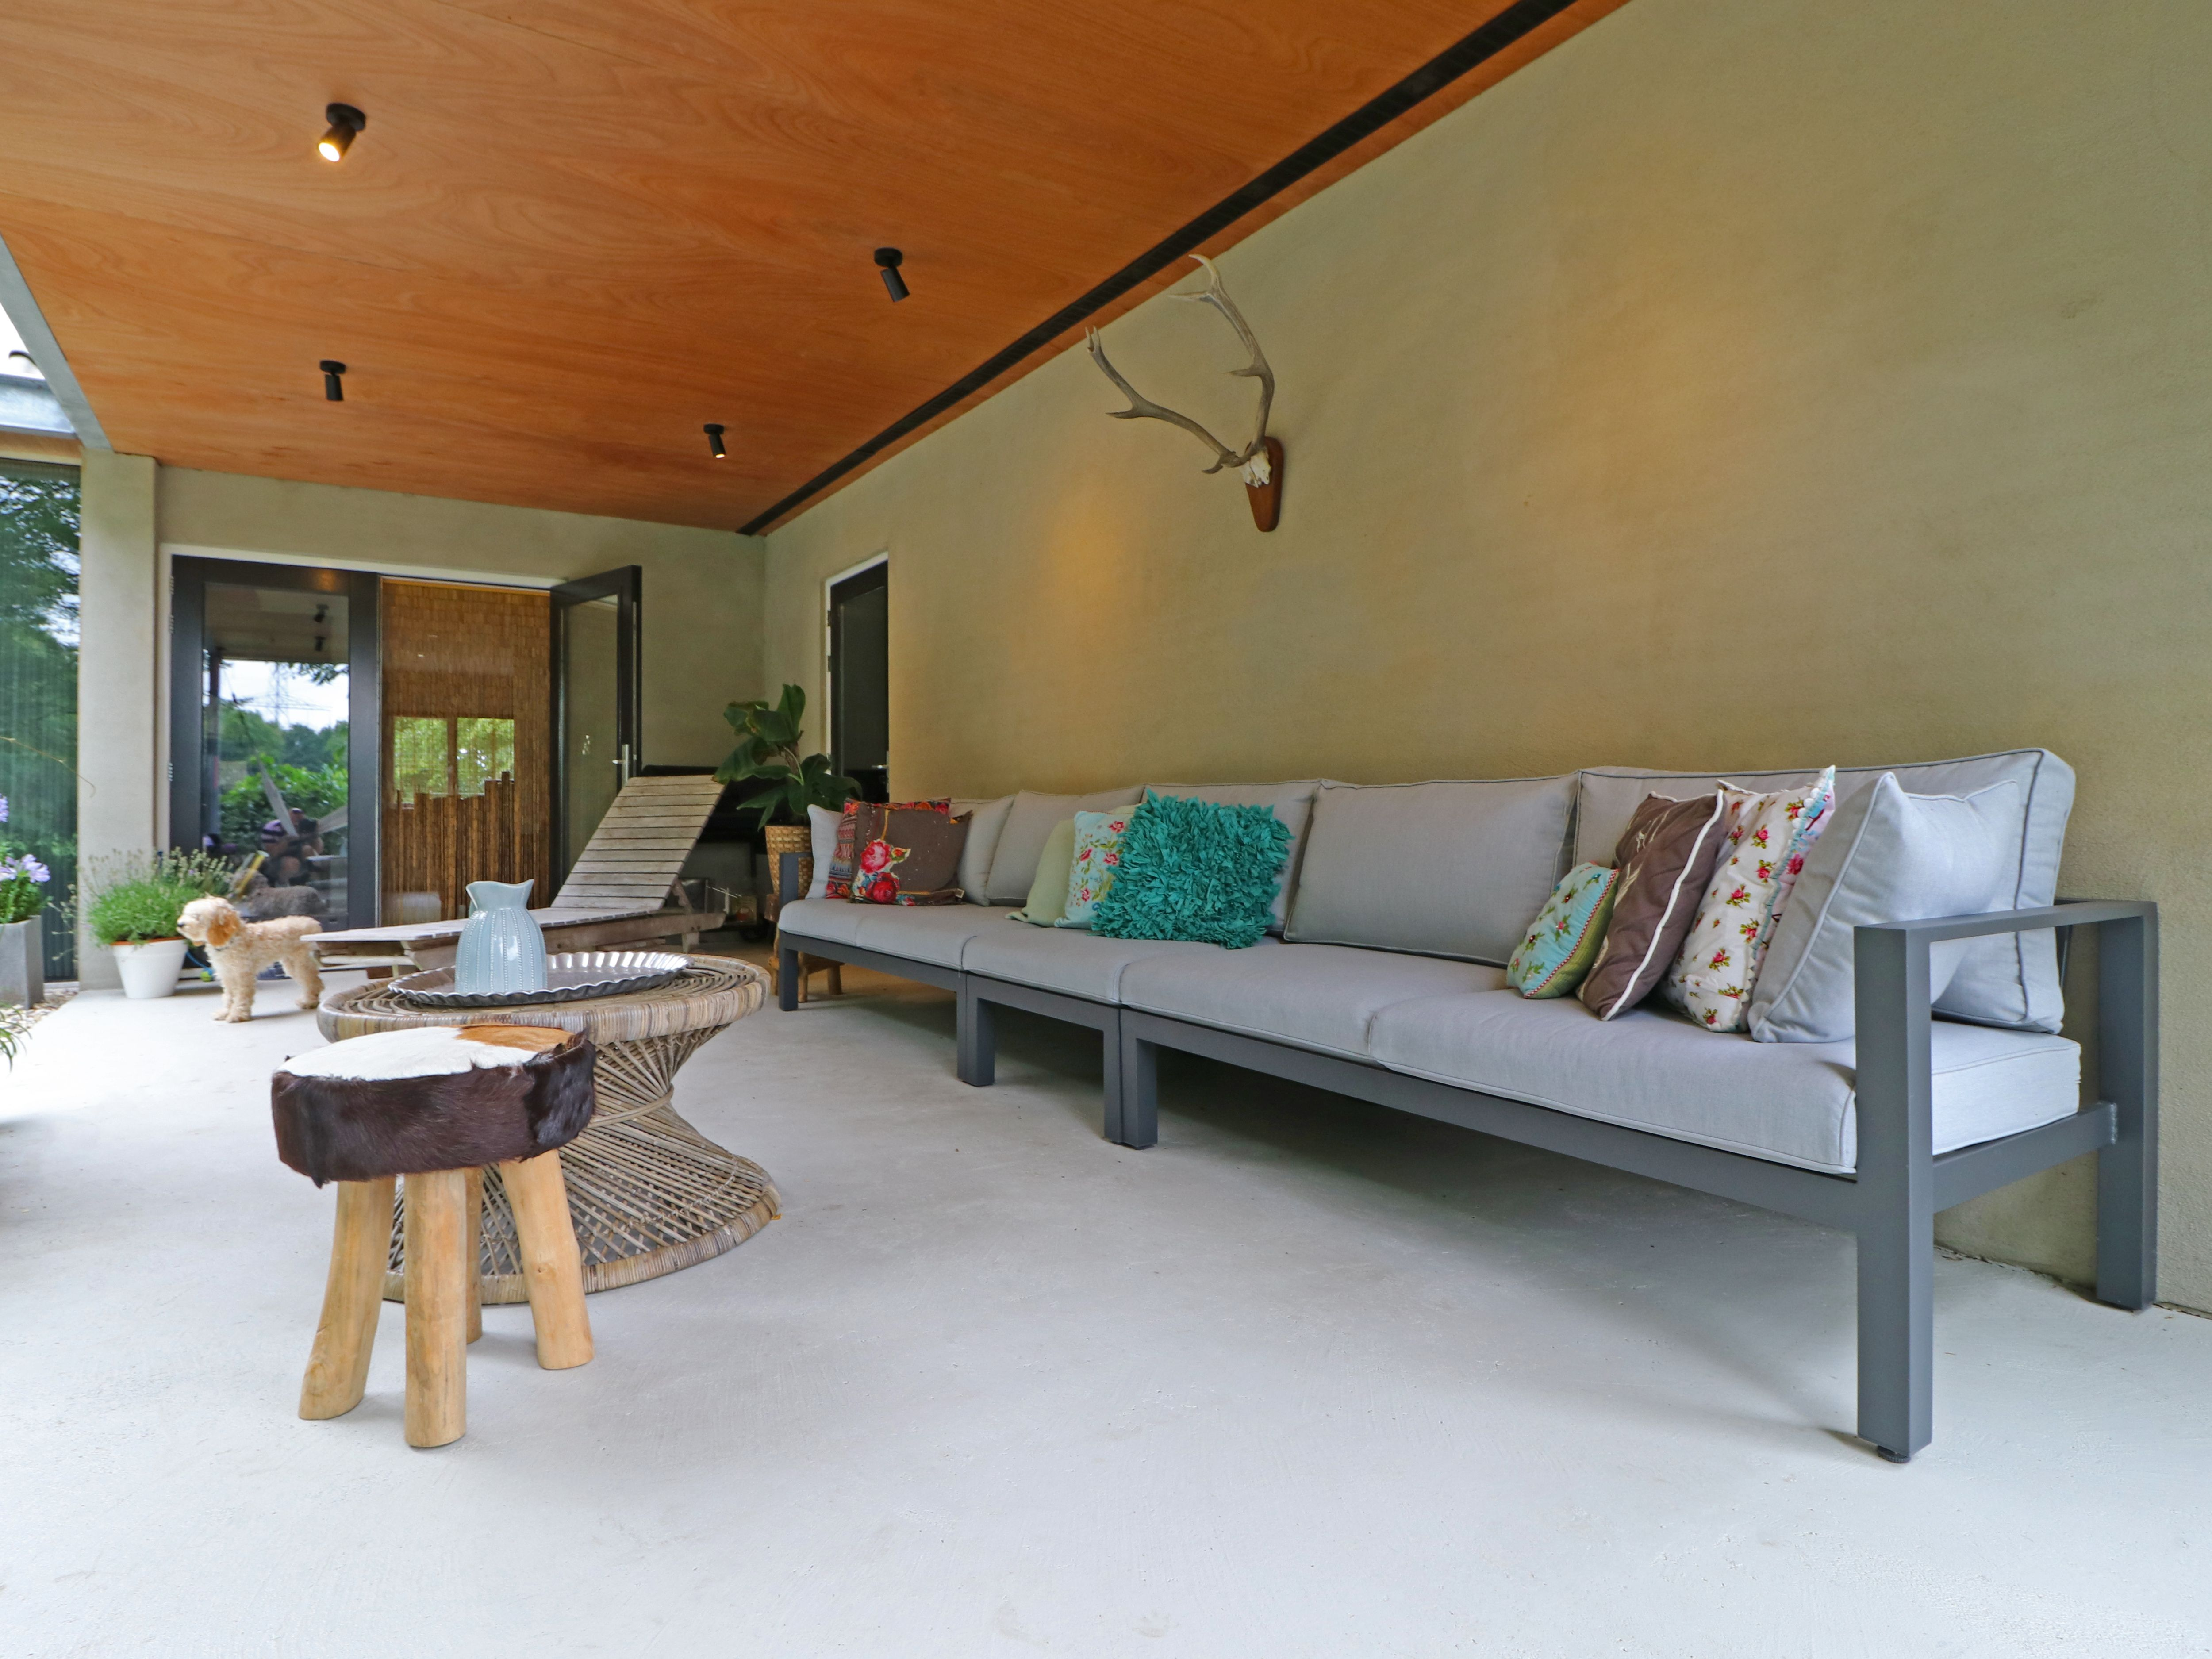 Forza Dresano Lounge Set Gartenmobel Loungeset Aluminium Lounge